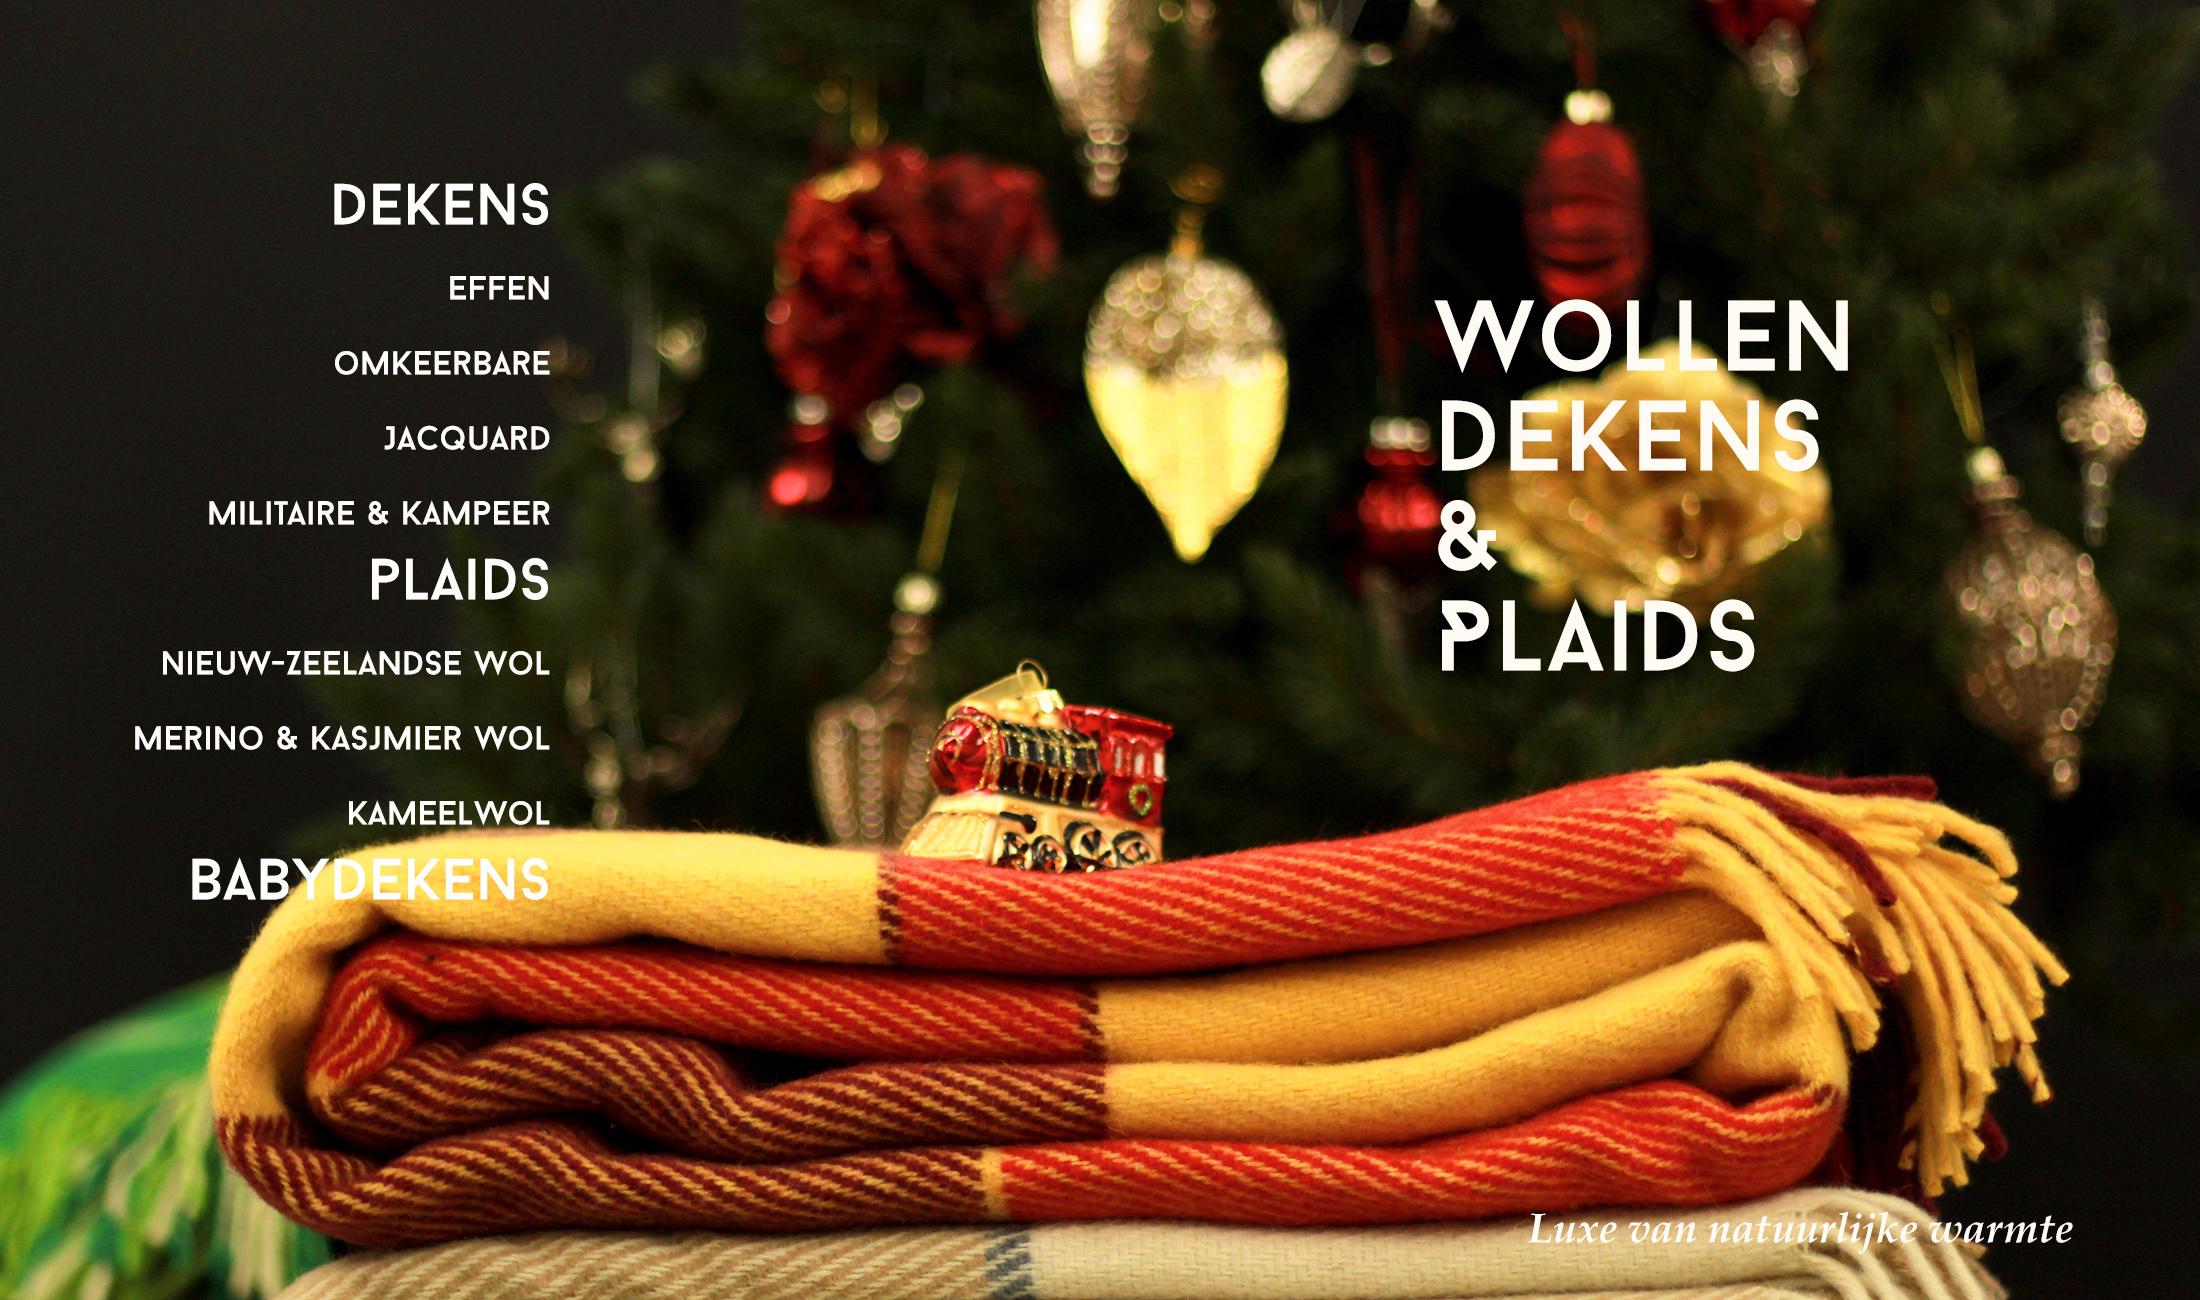 Wollen dekens en plaids voor Kerstmis